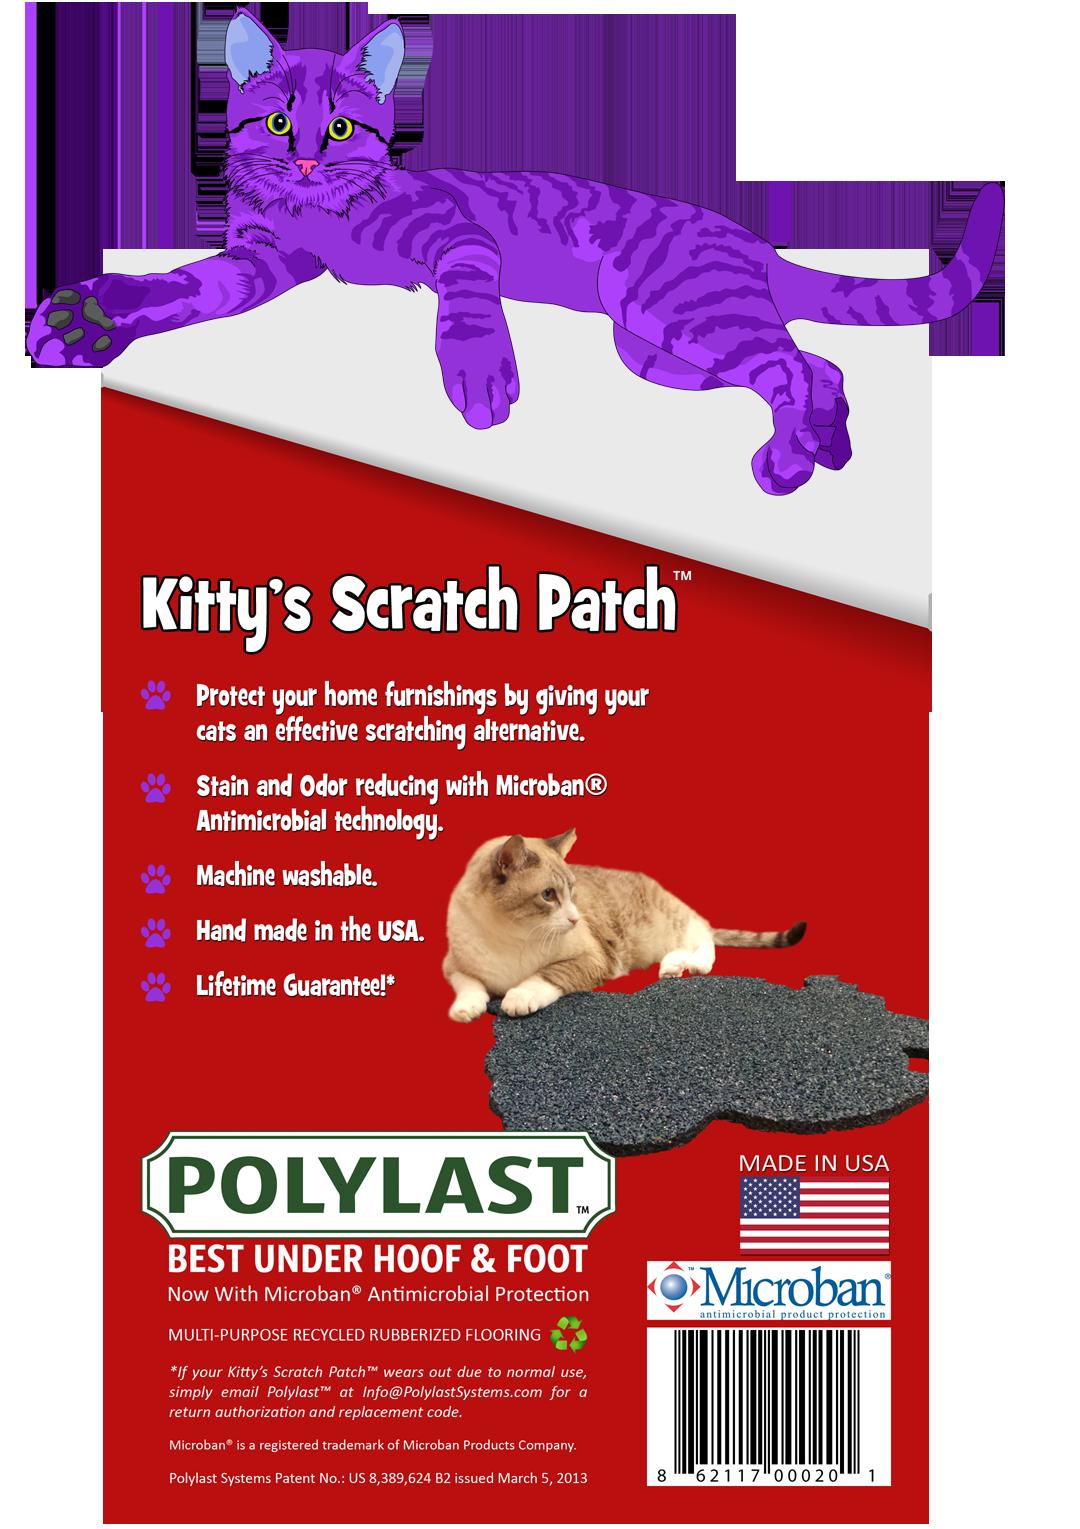 Kitty's Scratch Patch